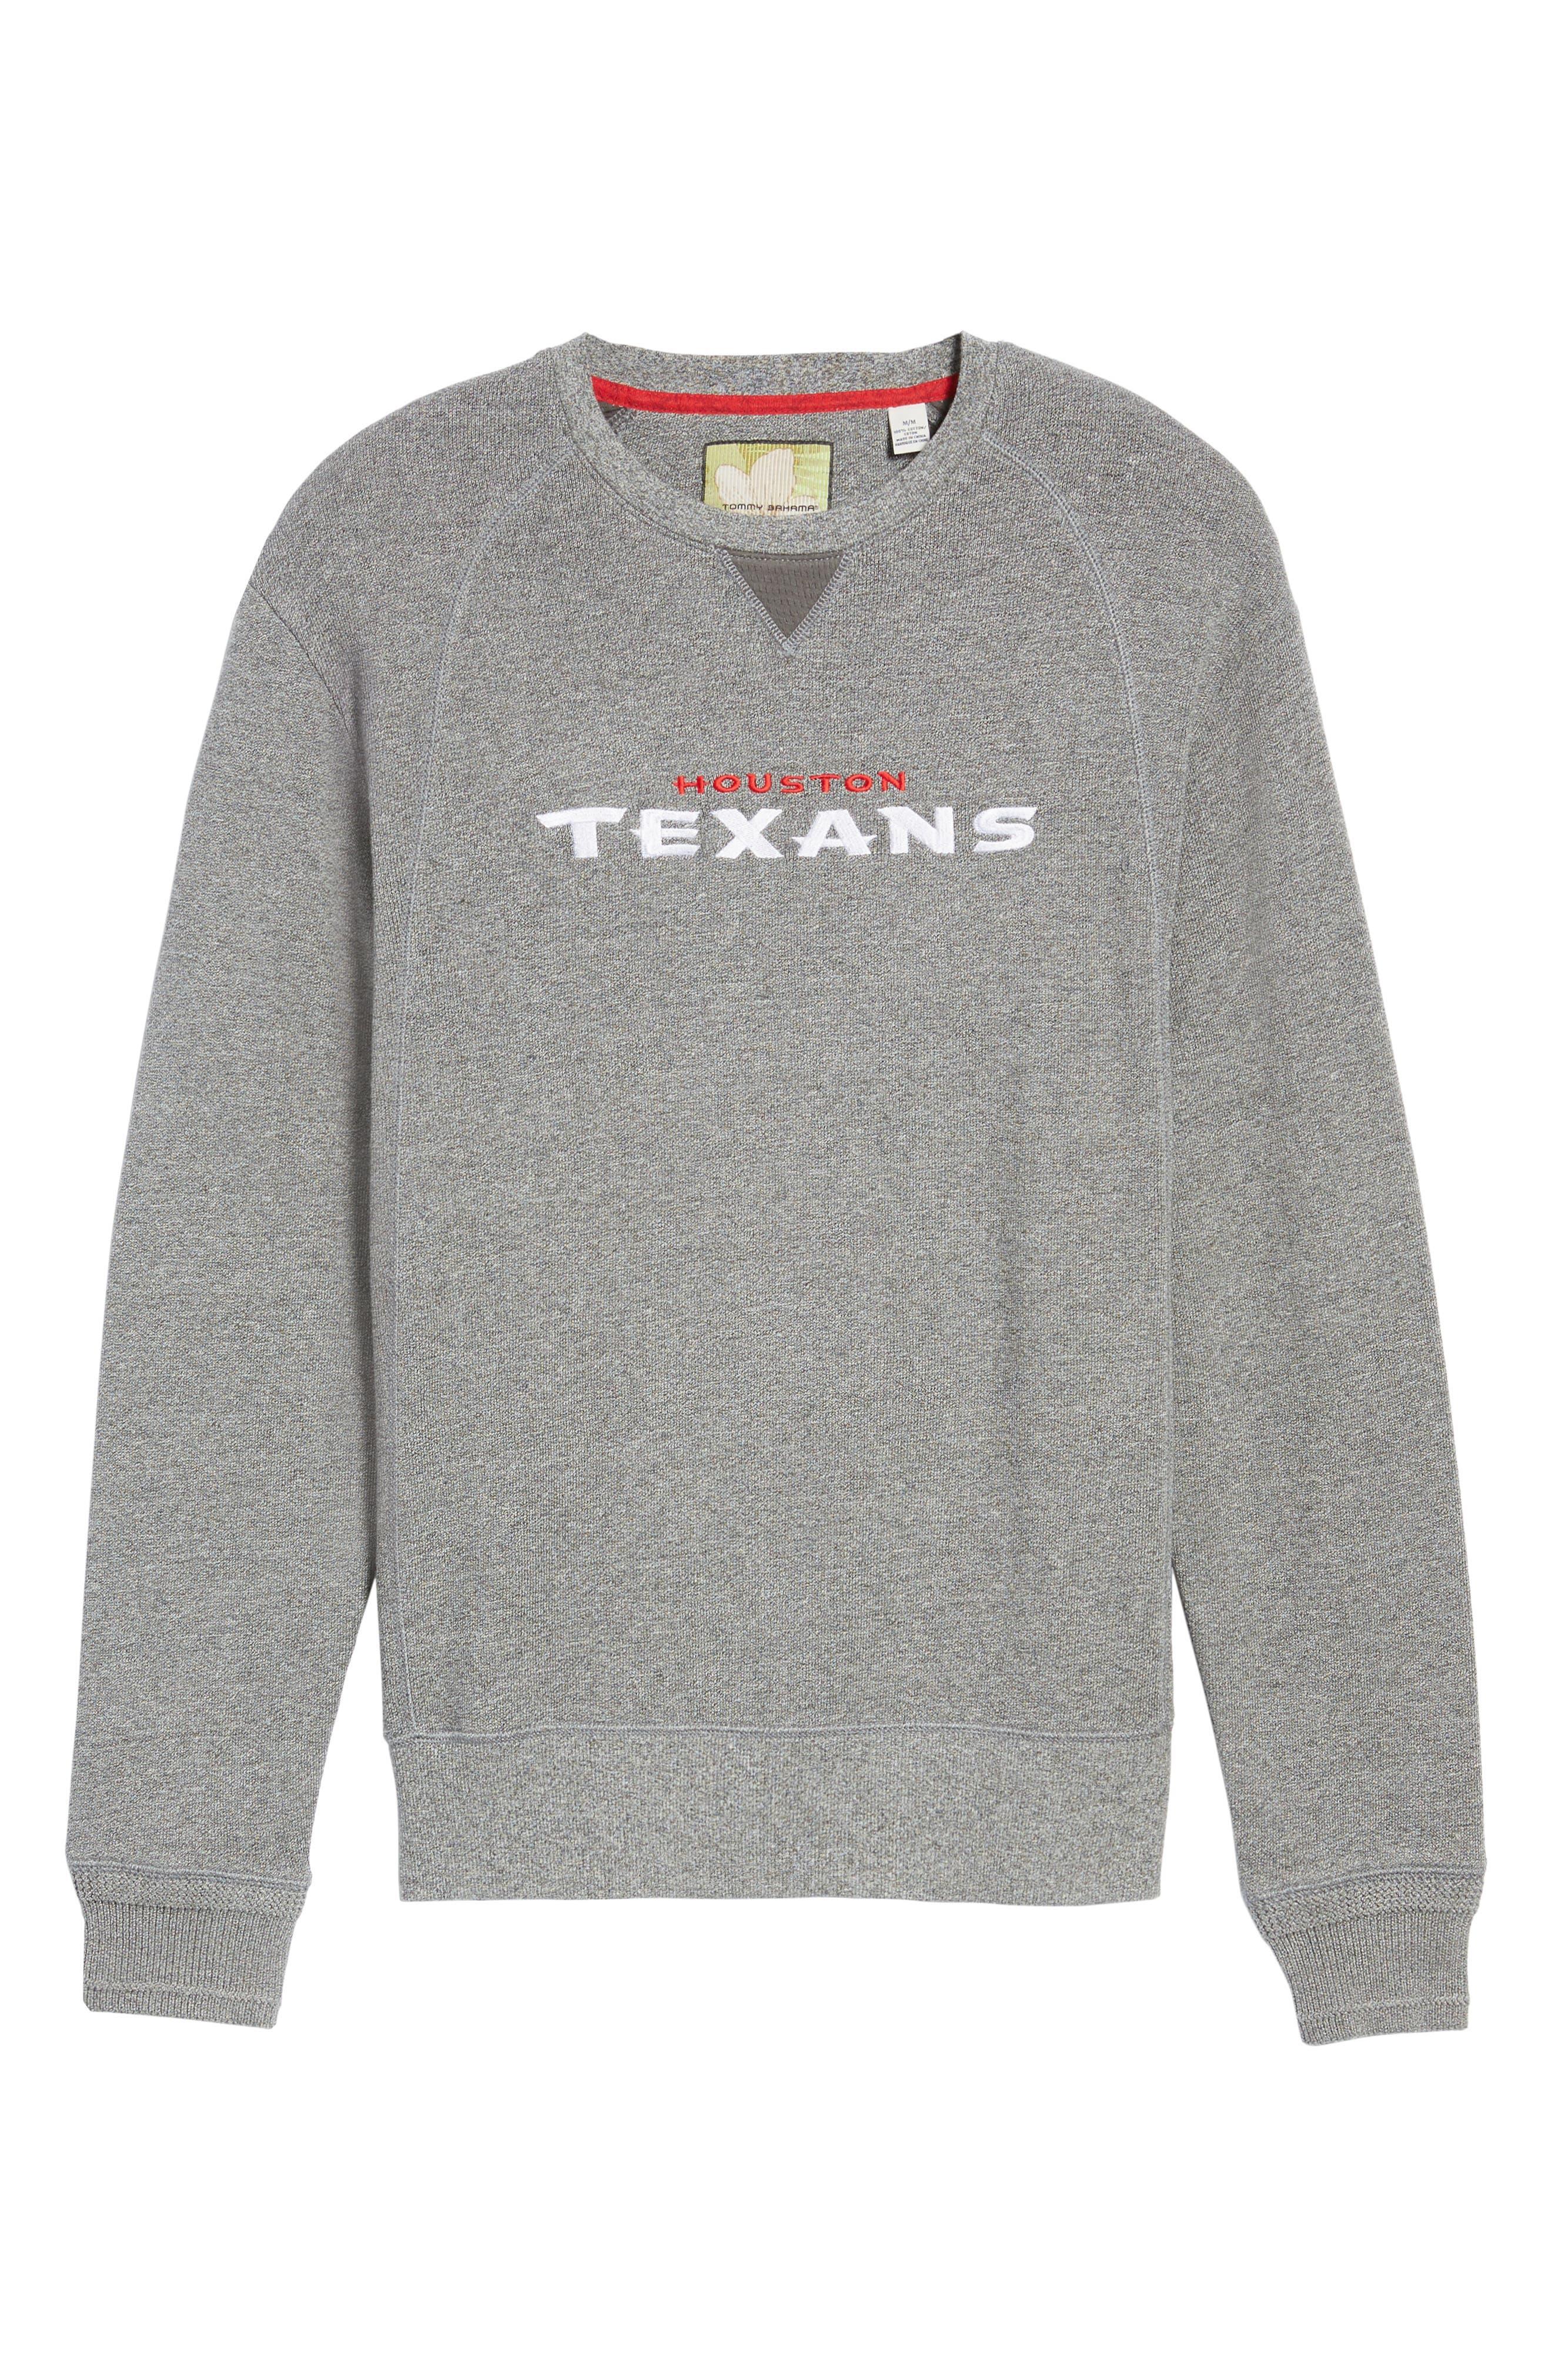 NFL Stitch of Liberty Embroidered Crewneck Sweatshirt,                             Alternate thumbnail 180, color,